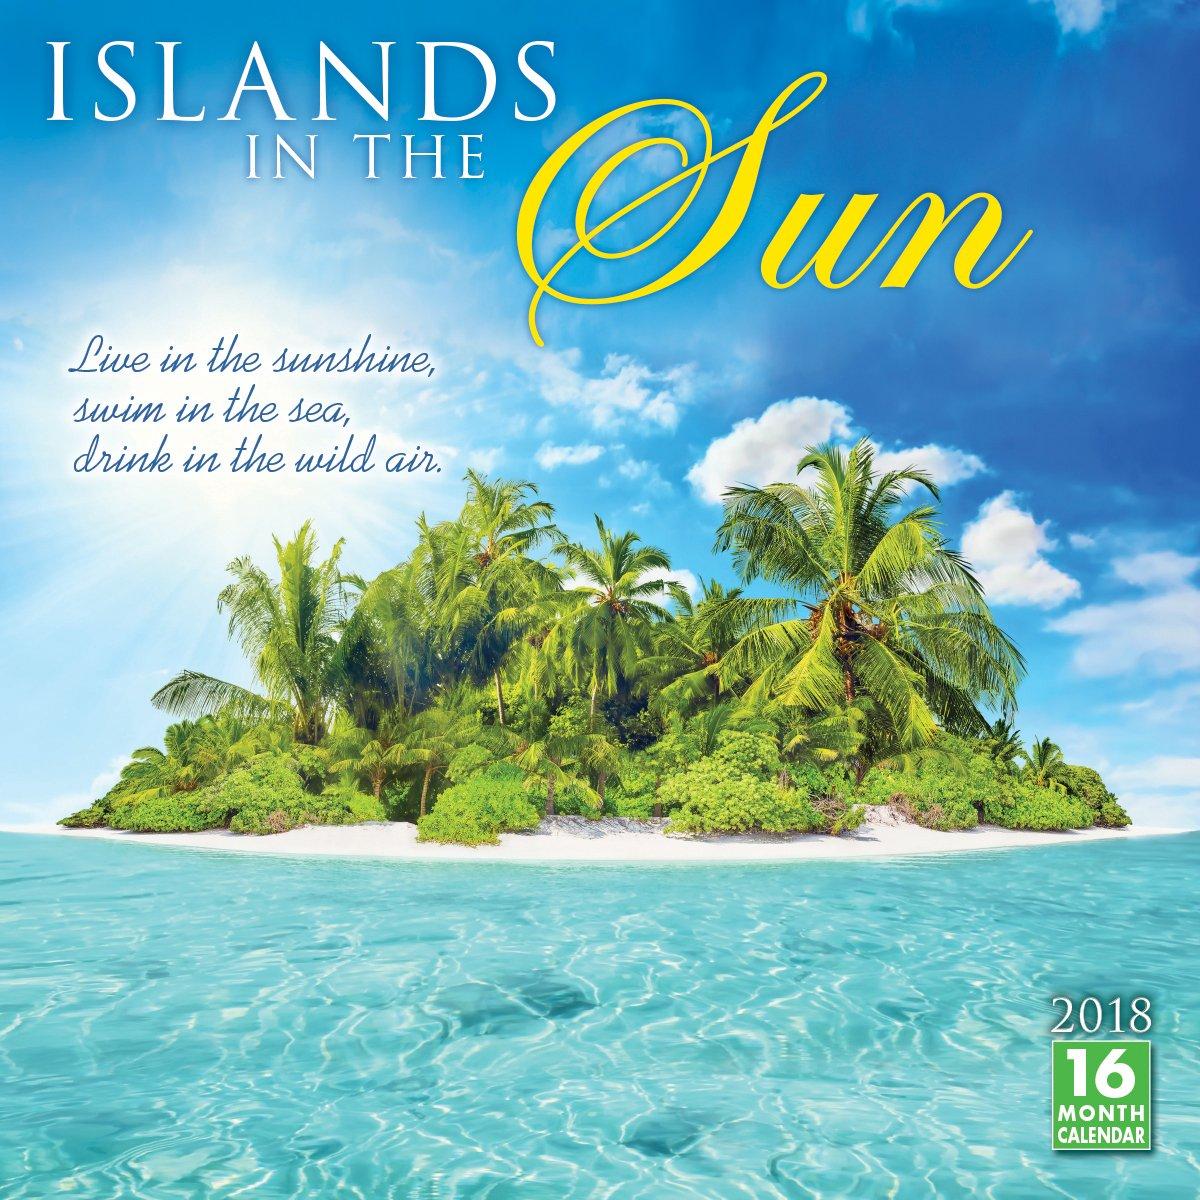 Islands In The Sun 2018 Wall Calendar (CA0139): Sellers ...